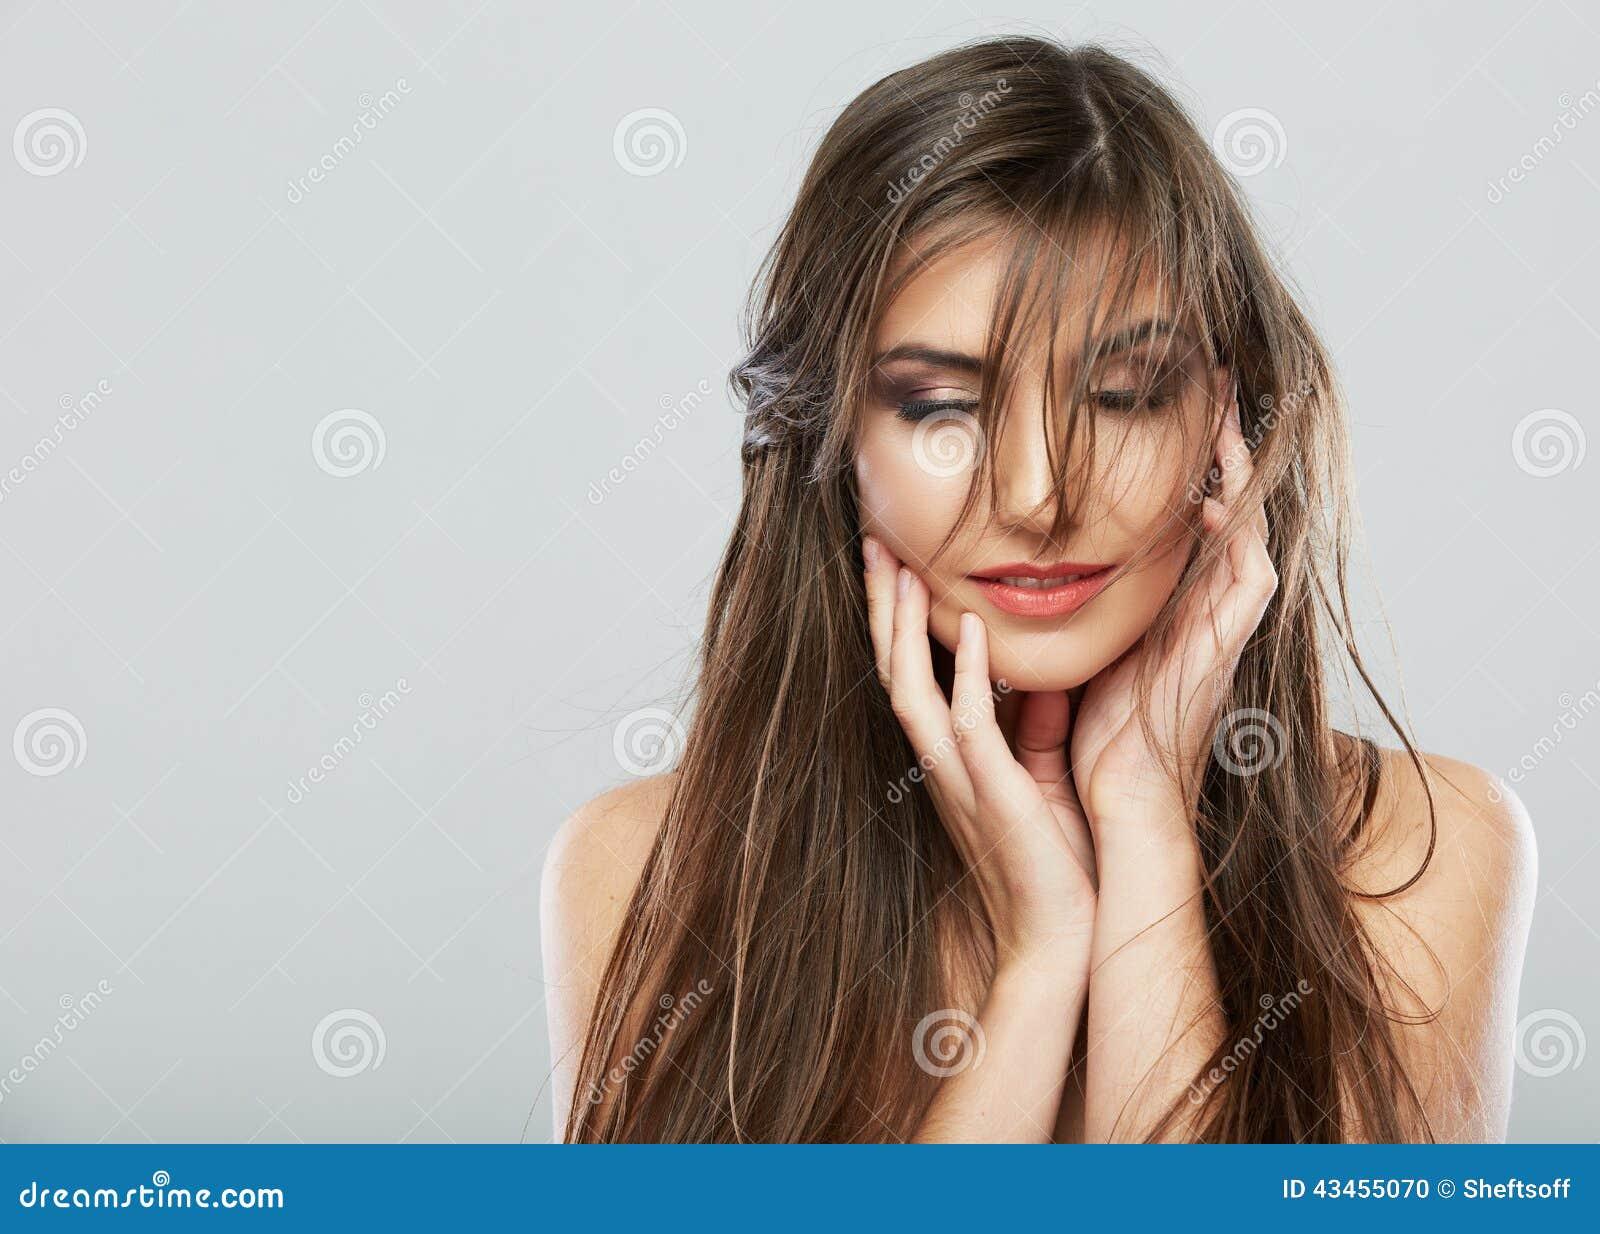 Hair style fashion woman face